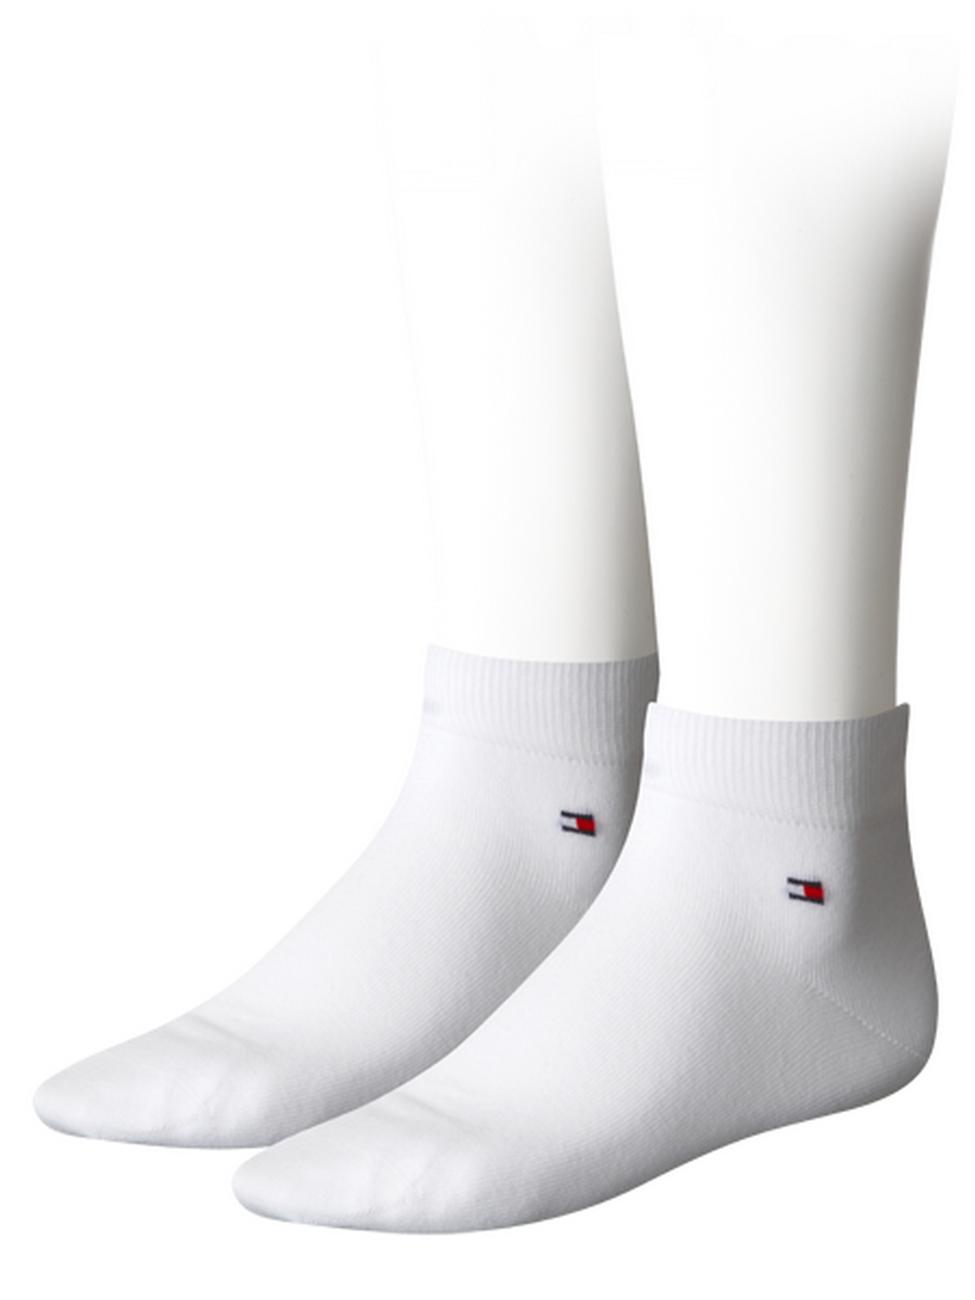 Tommy Hilfiger Herren Quarter Socken Flag - 2er Pack